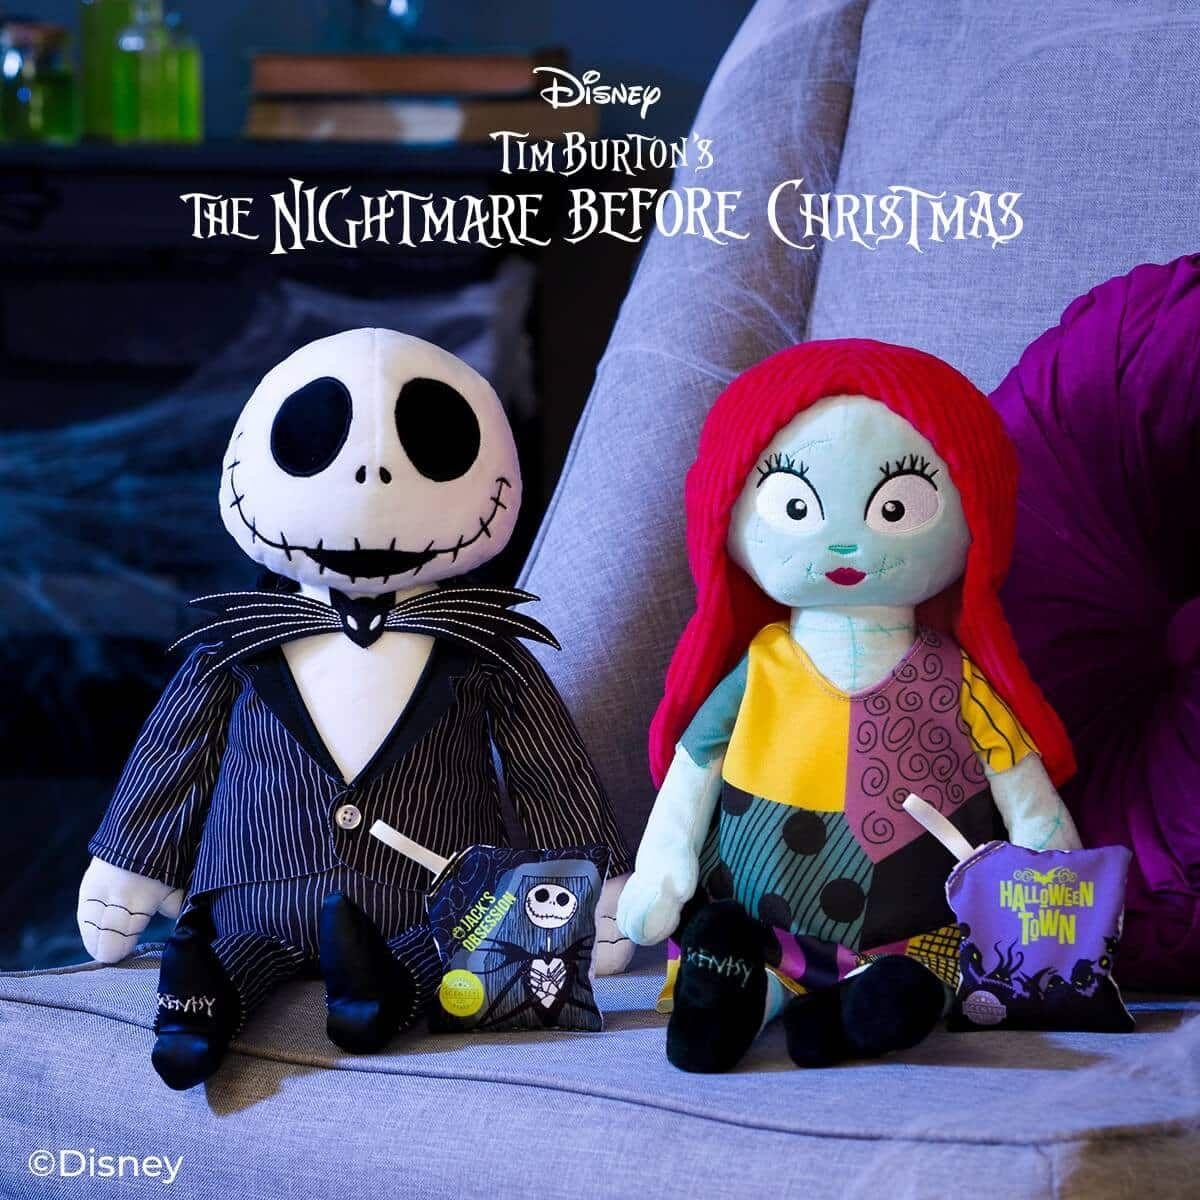 Scentsy Jack Skellington Nightmare Before Christmas Mini Warmer Plug In New